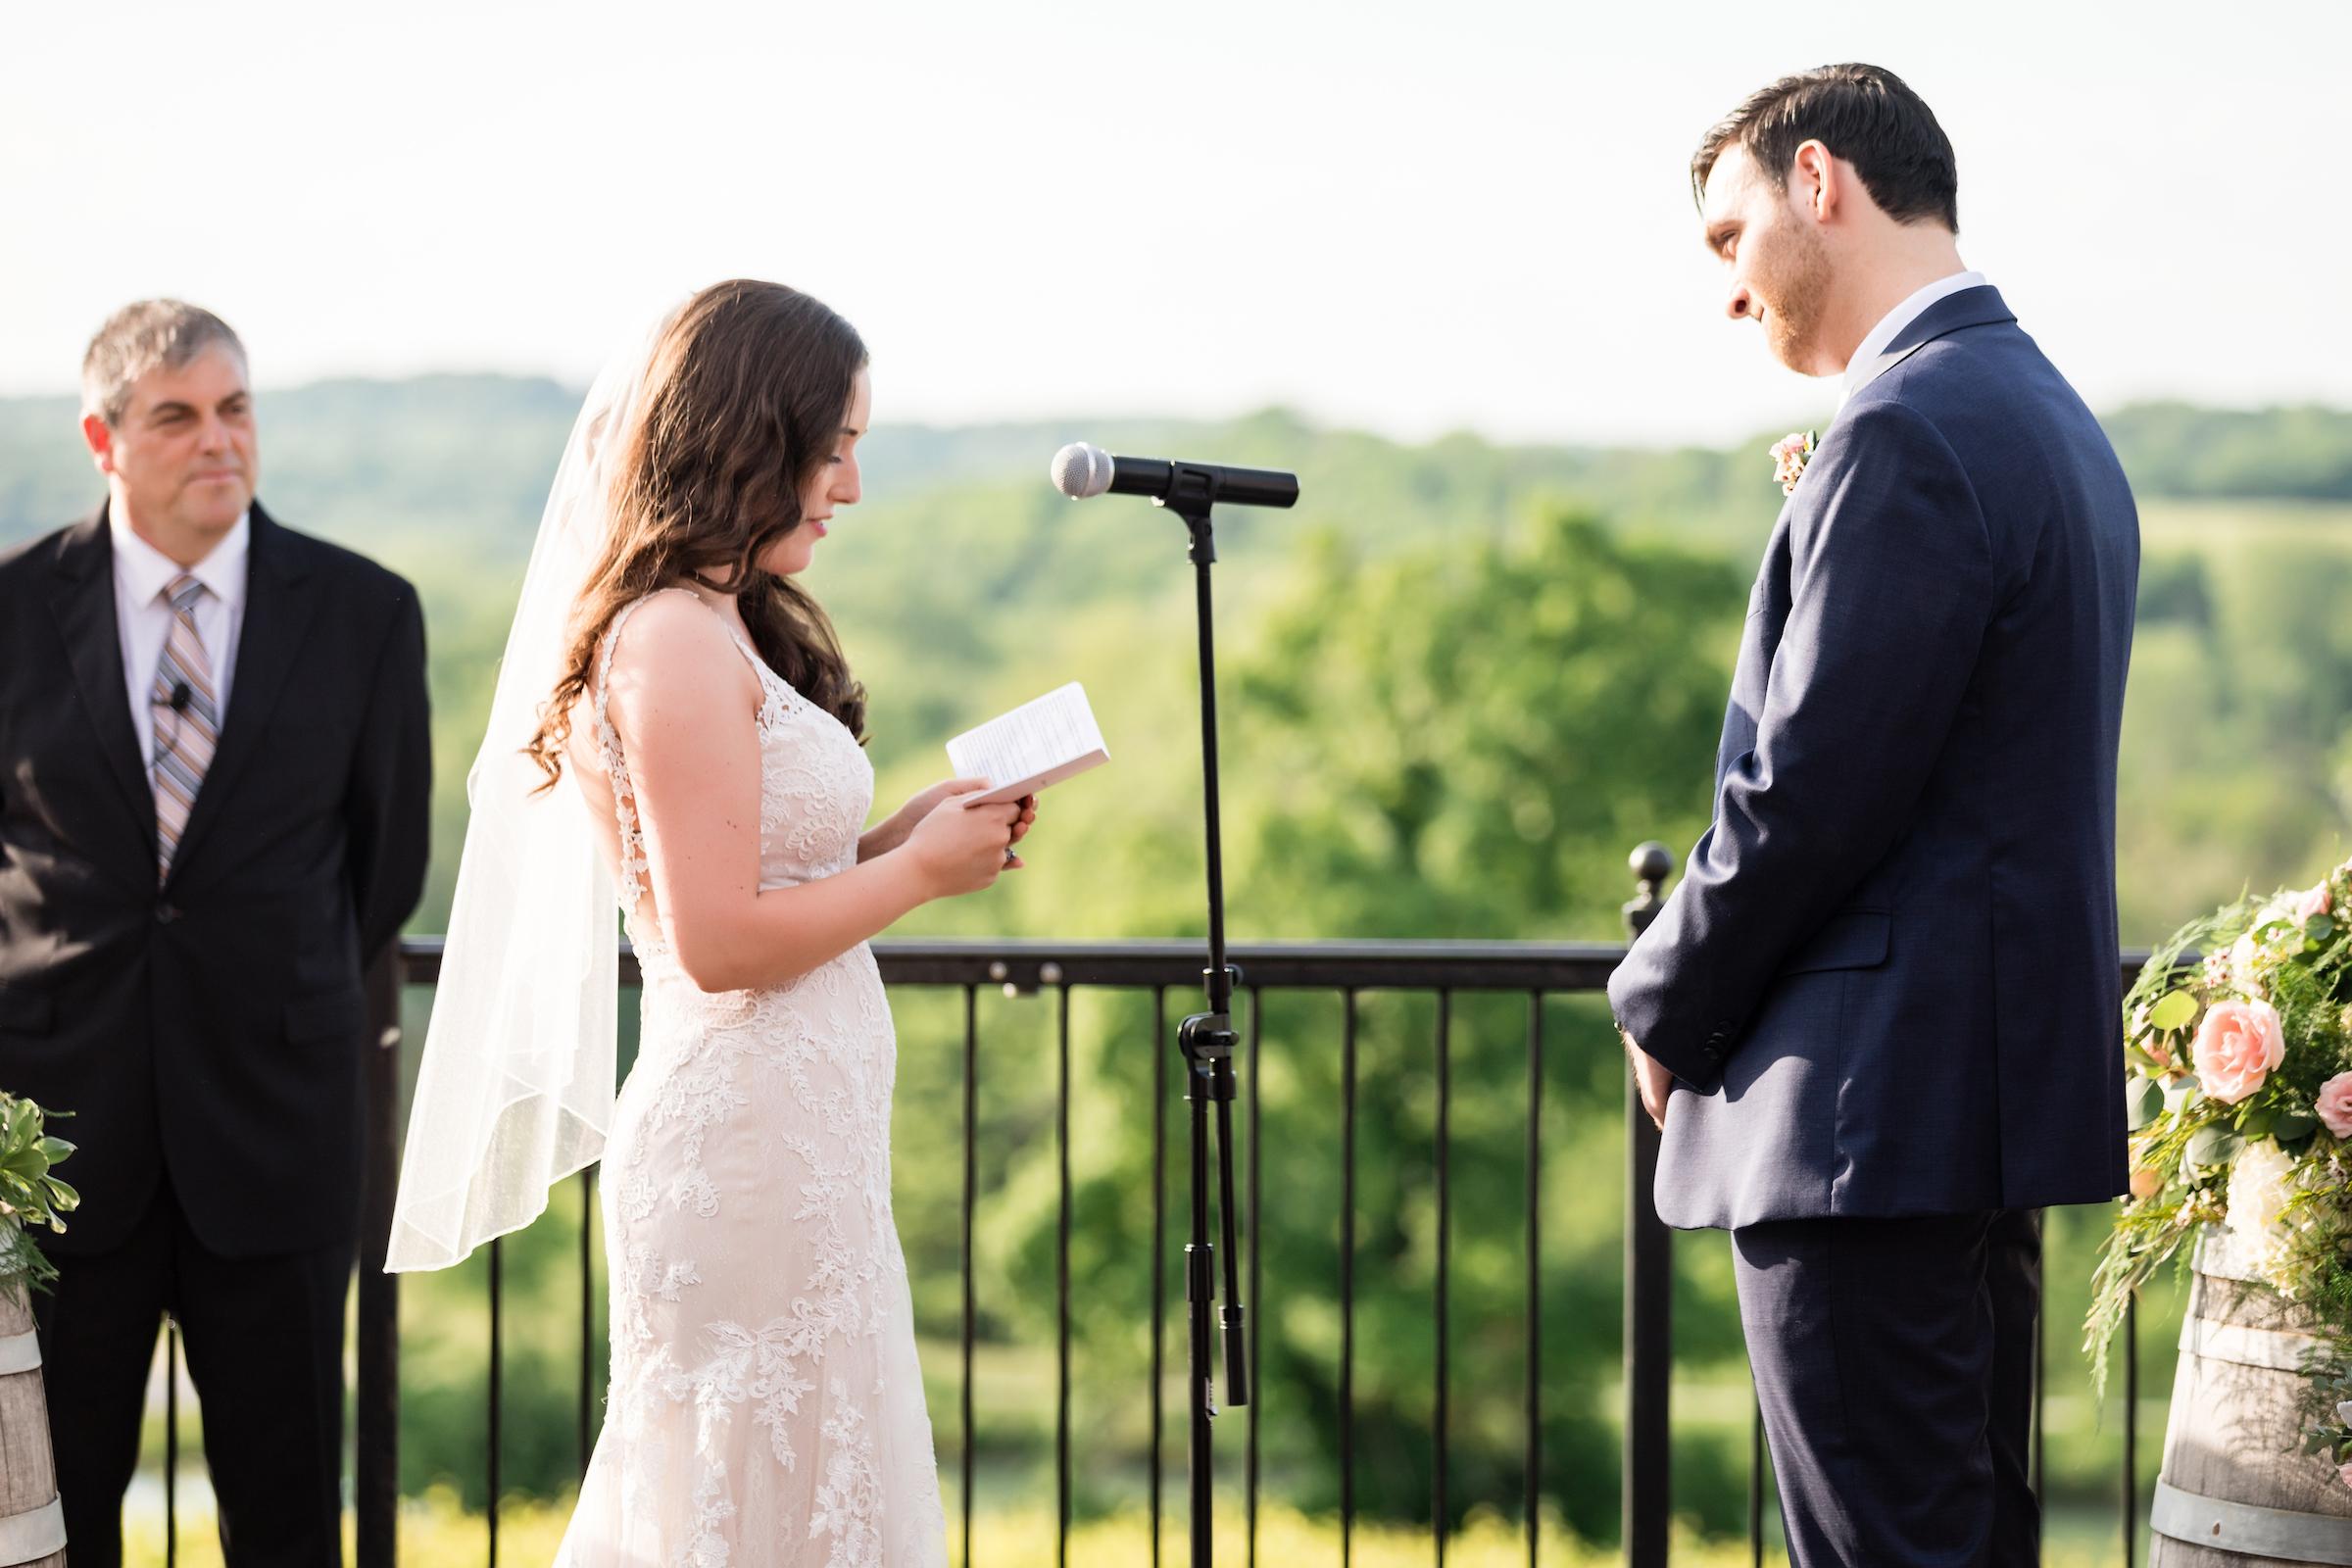 brielle-davis-events-kairos-photography-chandler-hill-wedding-ceremony-478.jpg